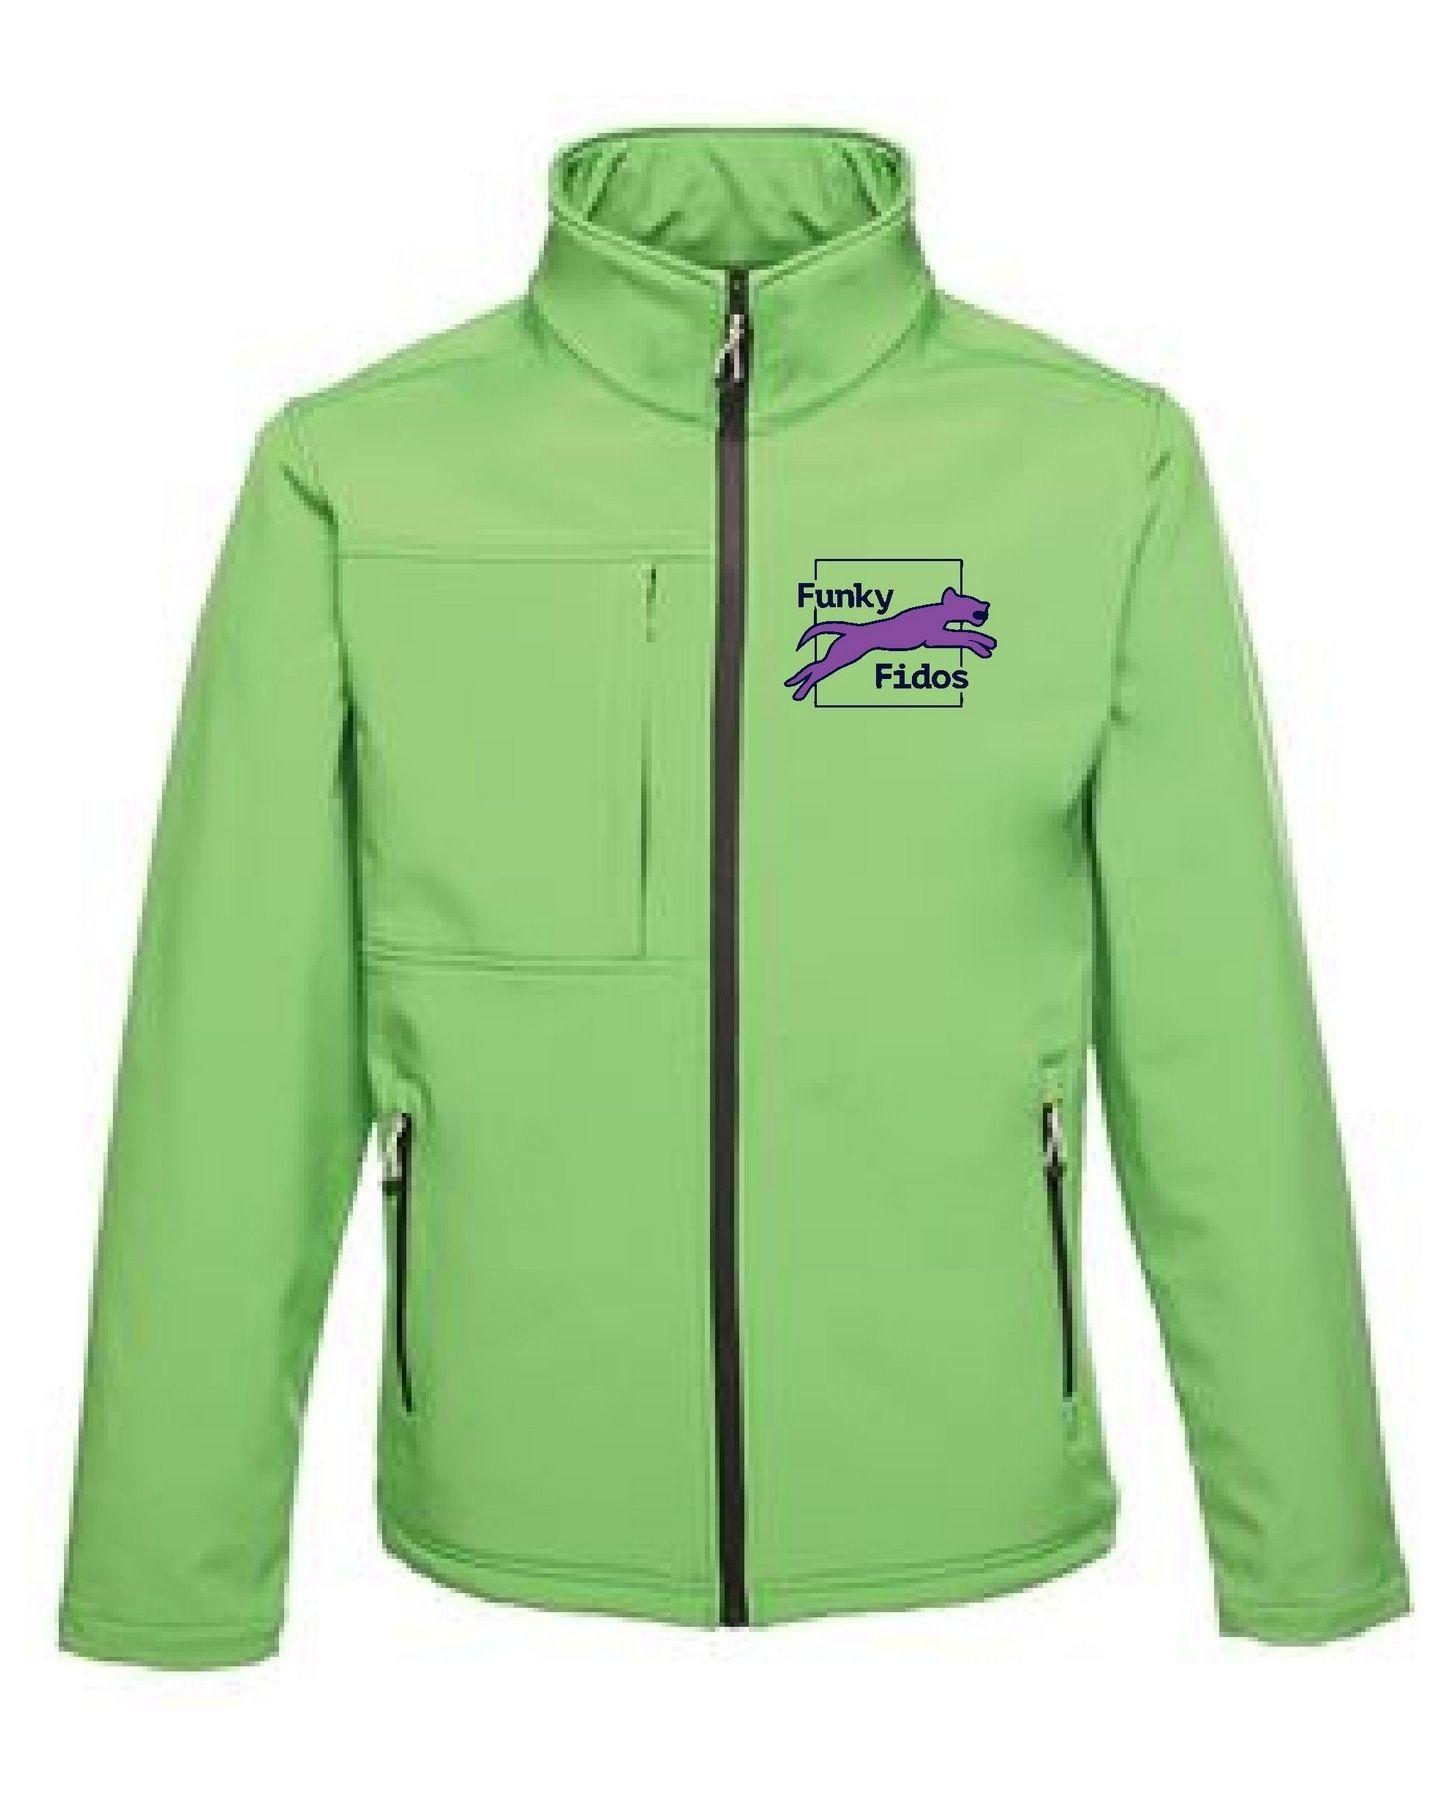 Funky Fidos – Softshell Jacket Unisex (Green)